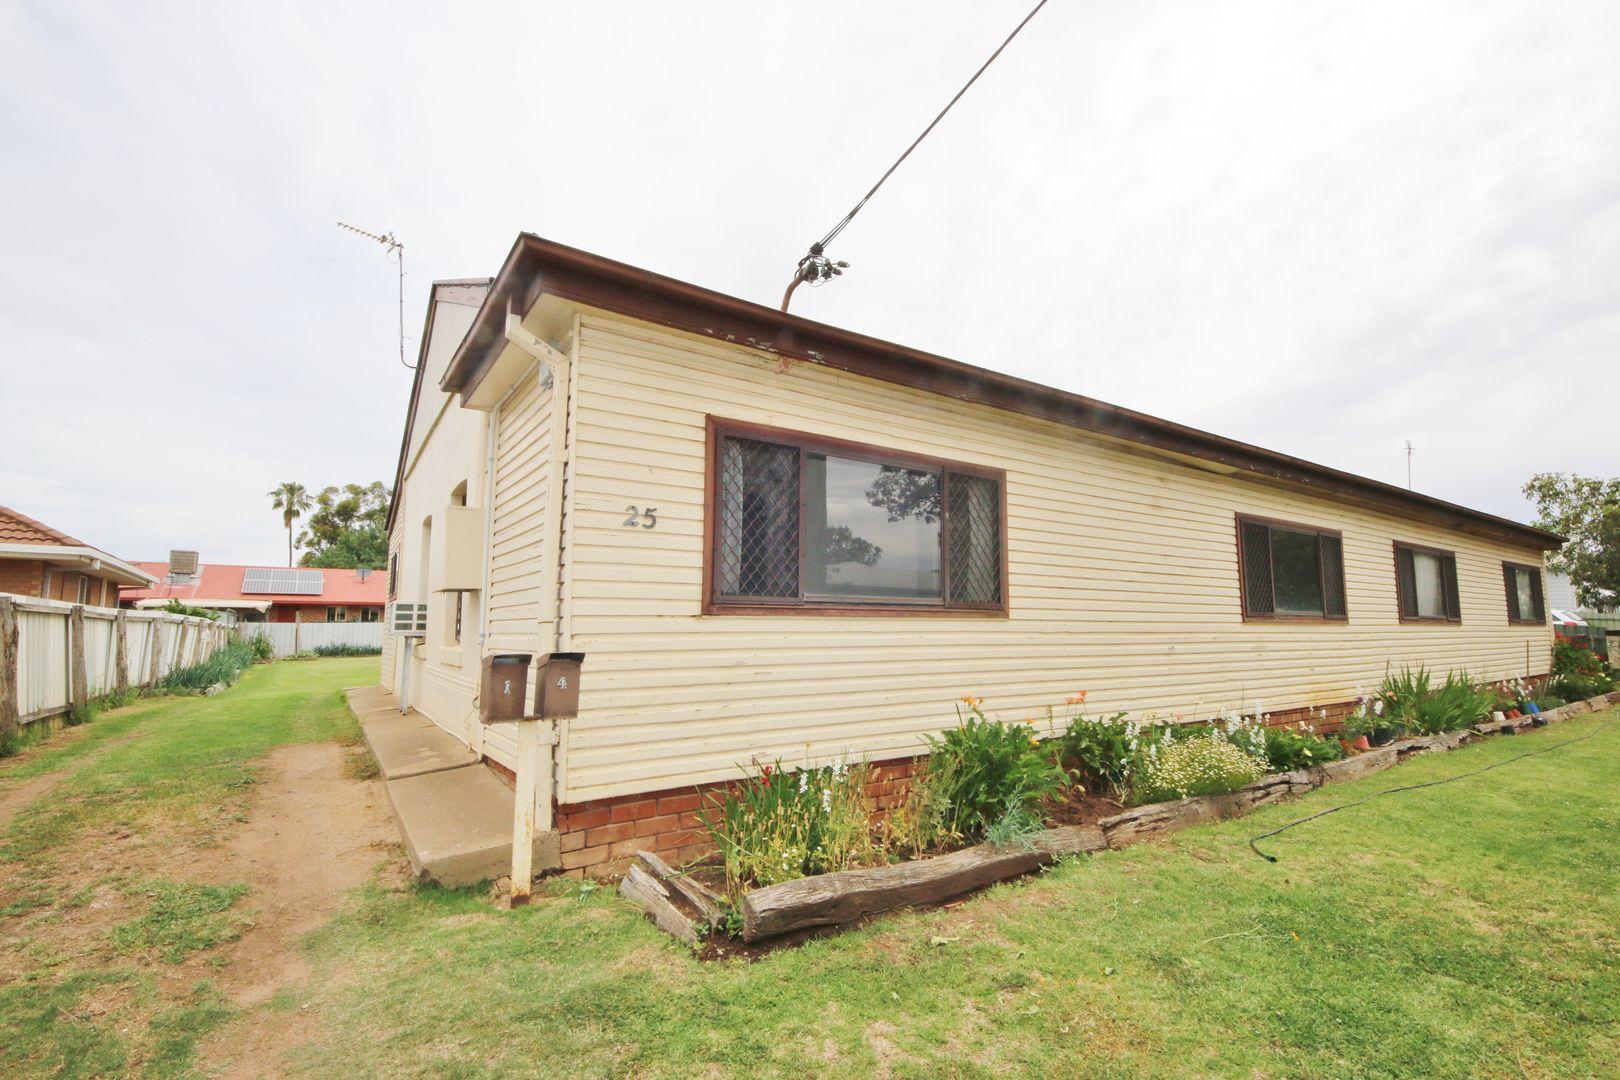 3/25 Macleay Street, Dubbo NSW 2830, Image 0